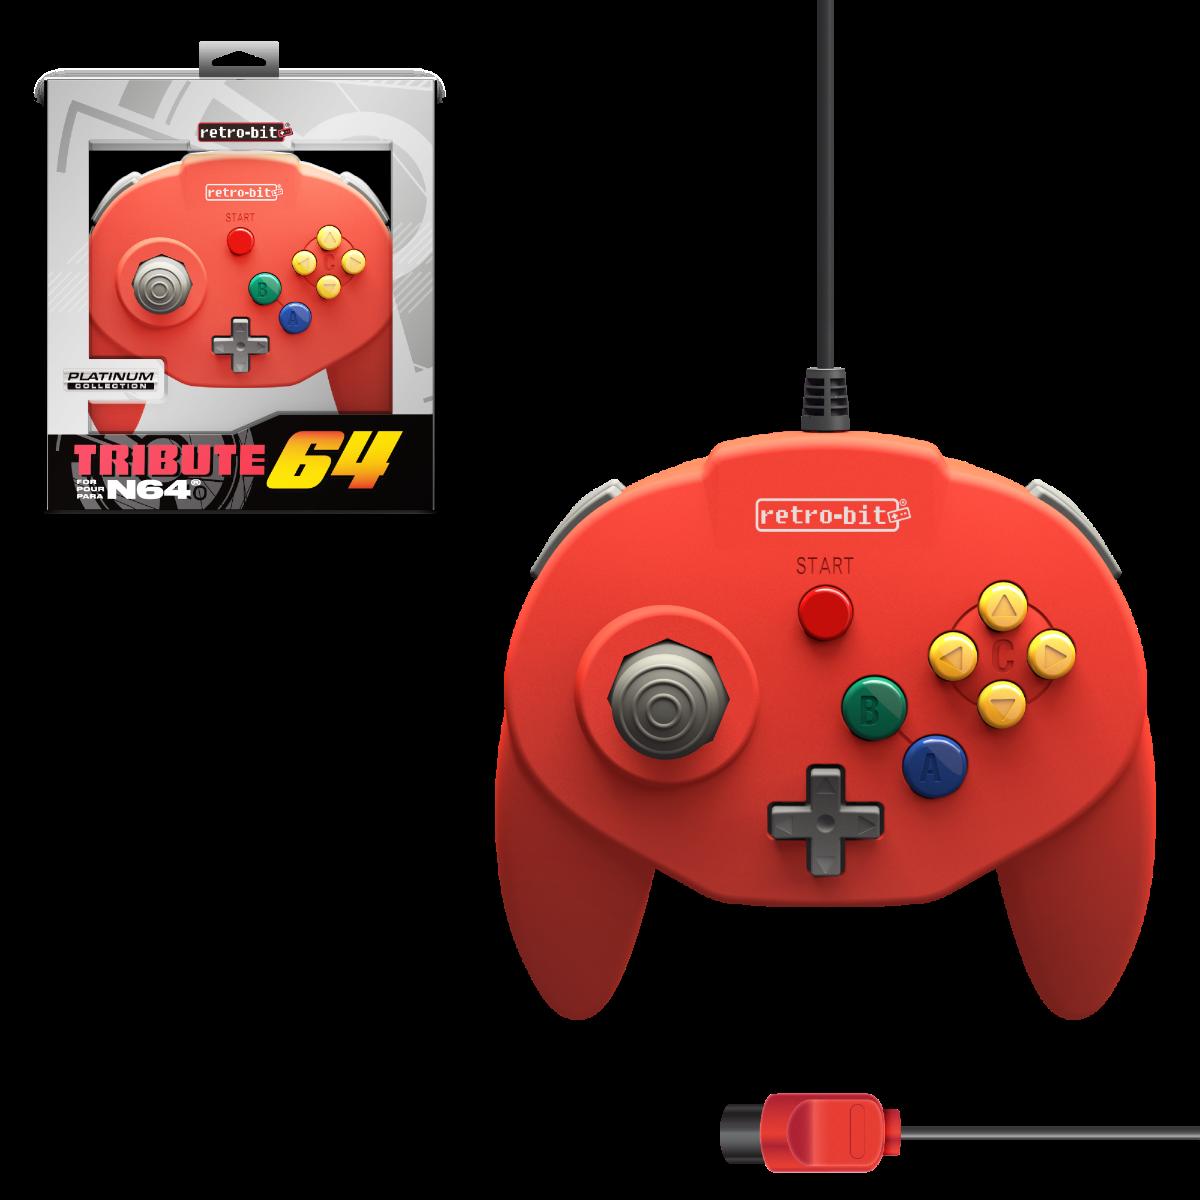 Tribute64, red, N64, nintendo 64, tribute